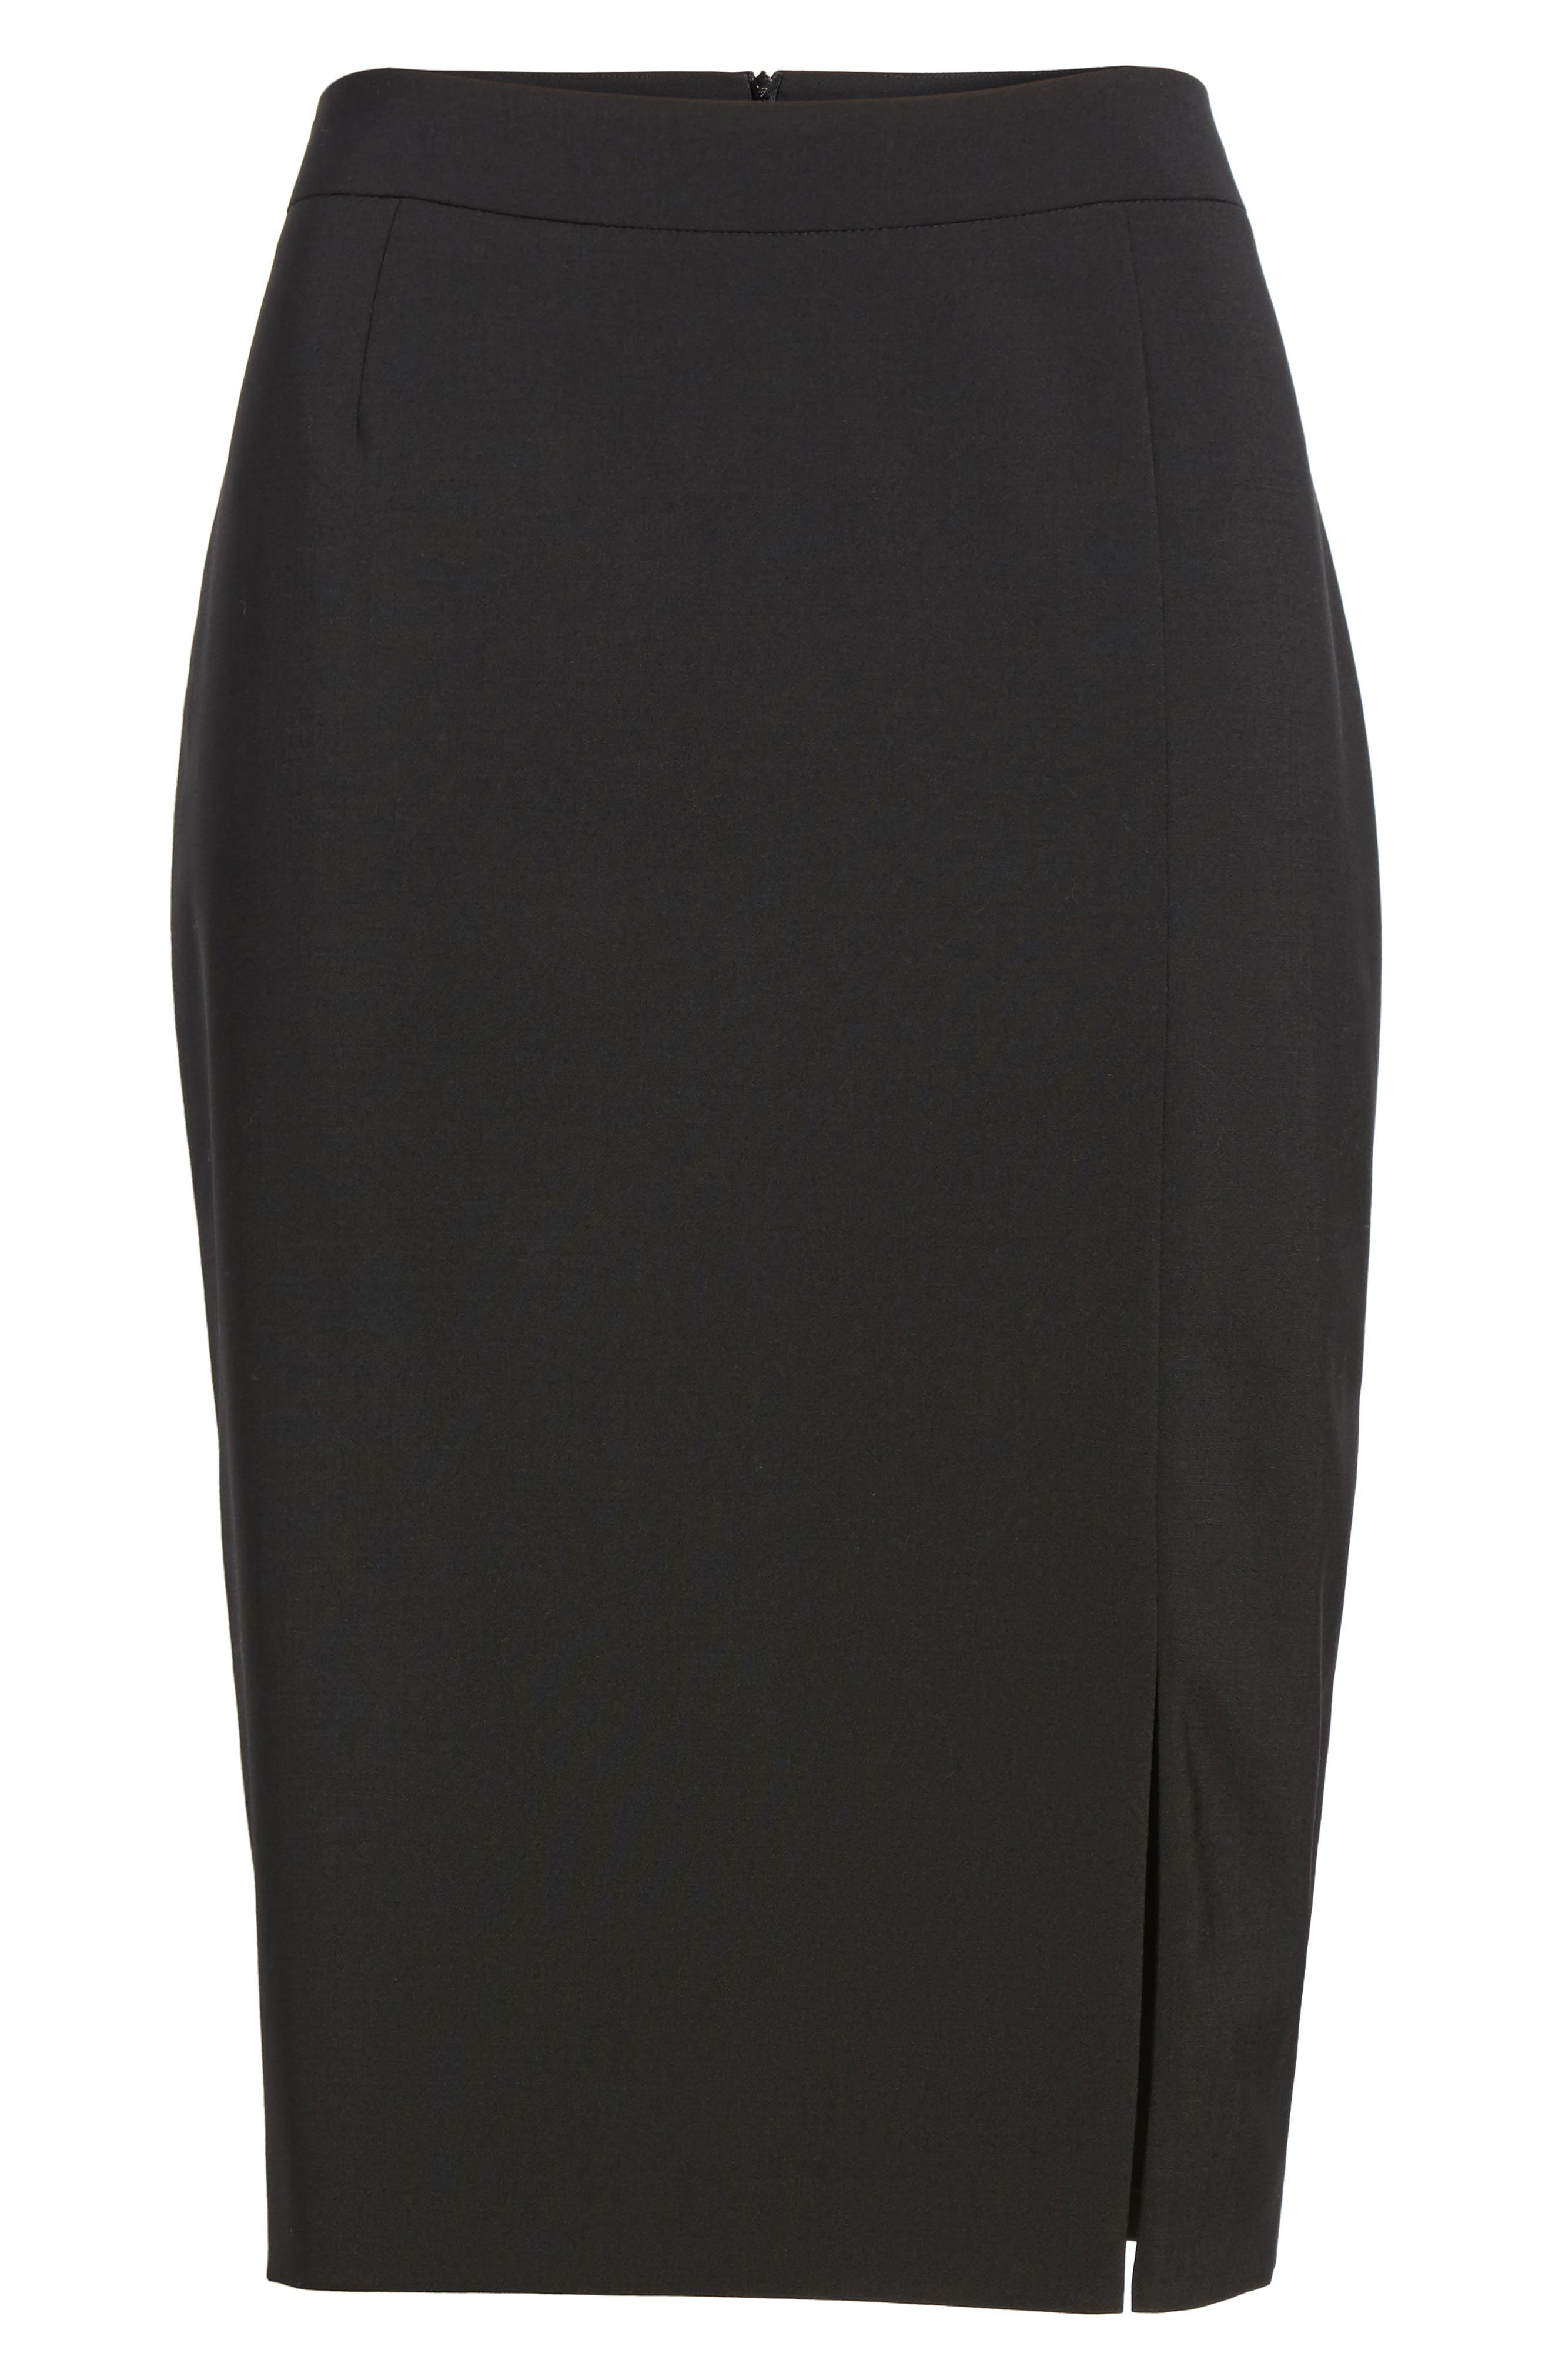 Volania Stretch Wool Pencil Skirt,                             Alternate thumbnail 6, color,                             BLACK